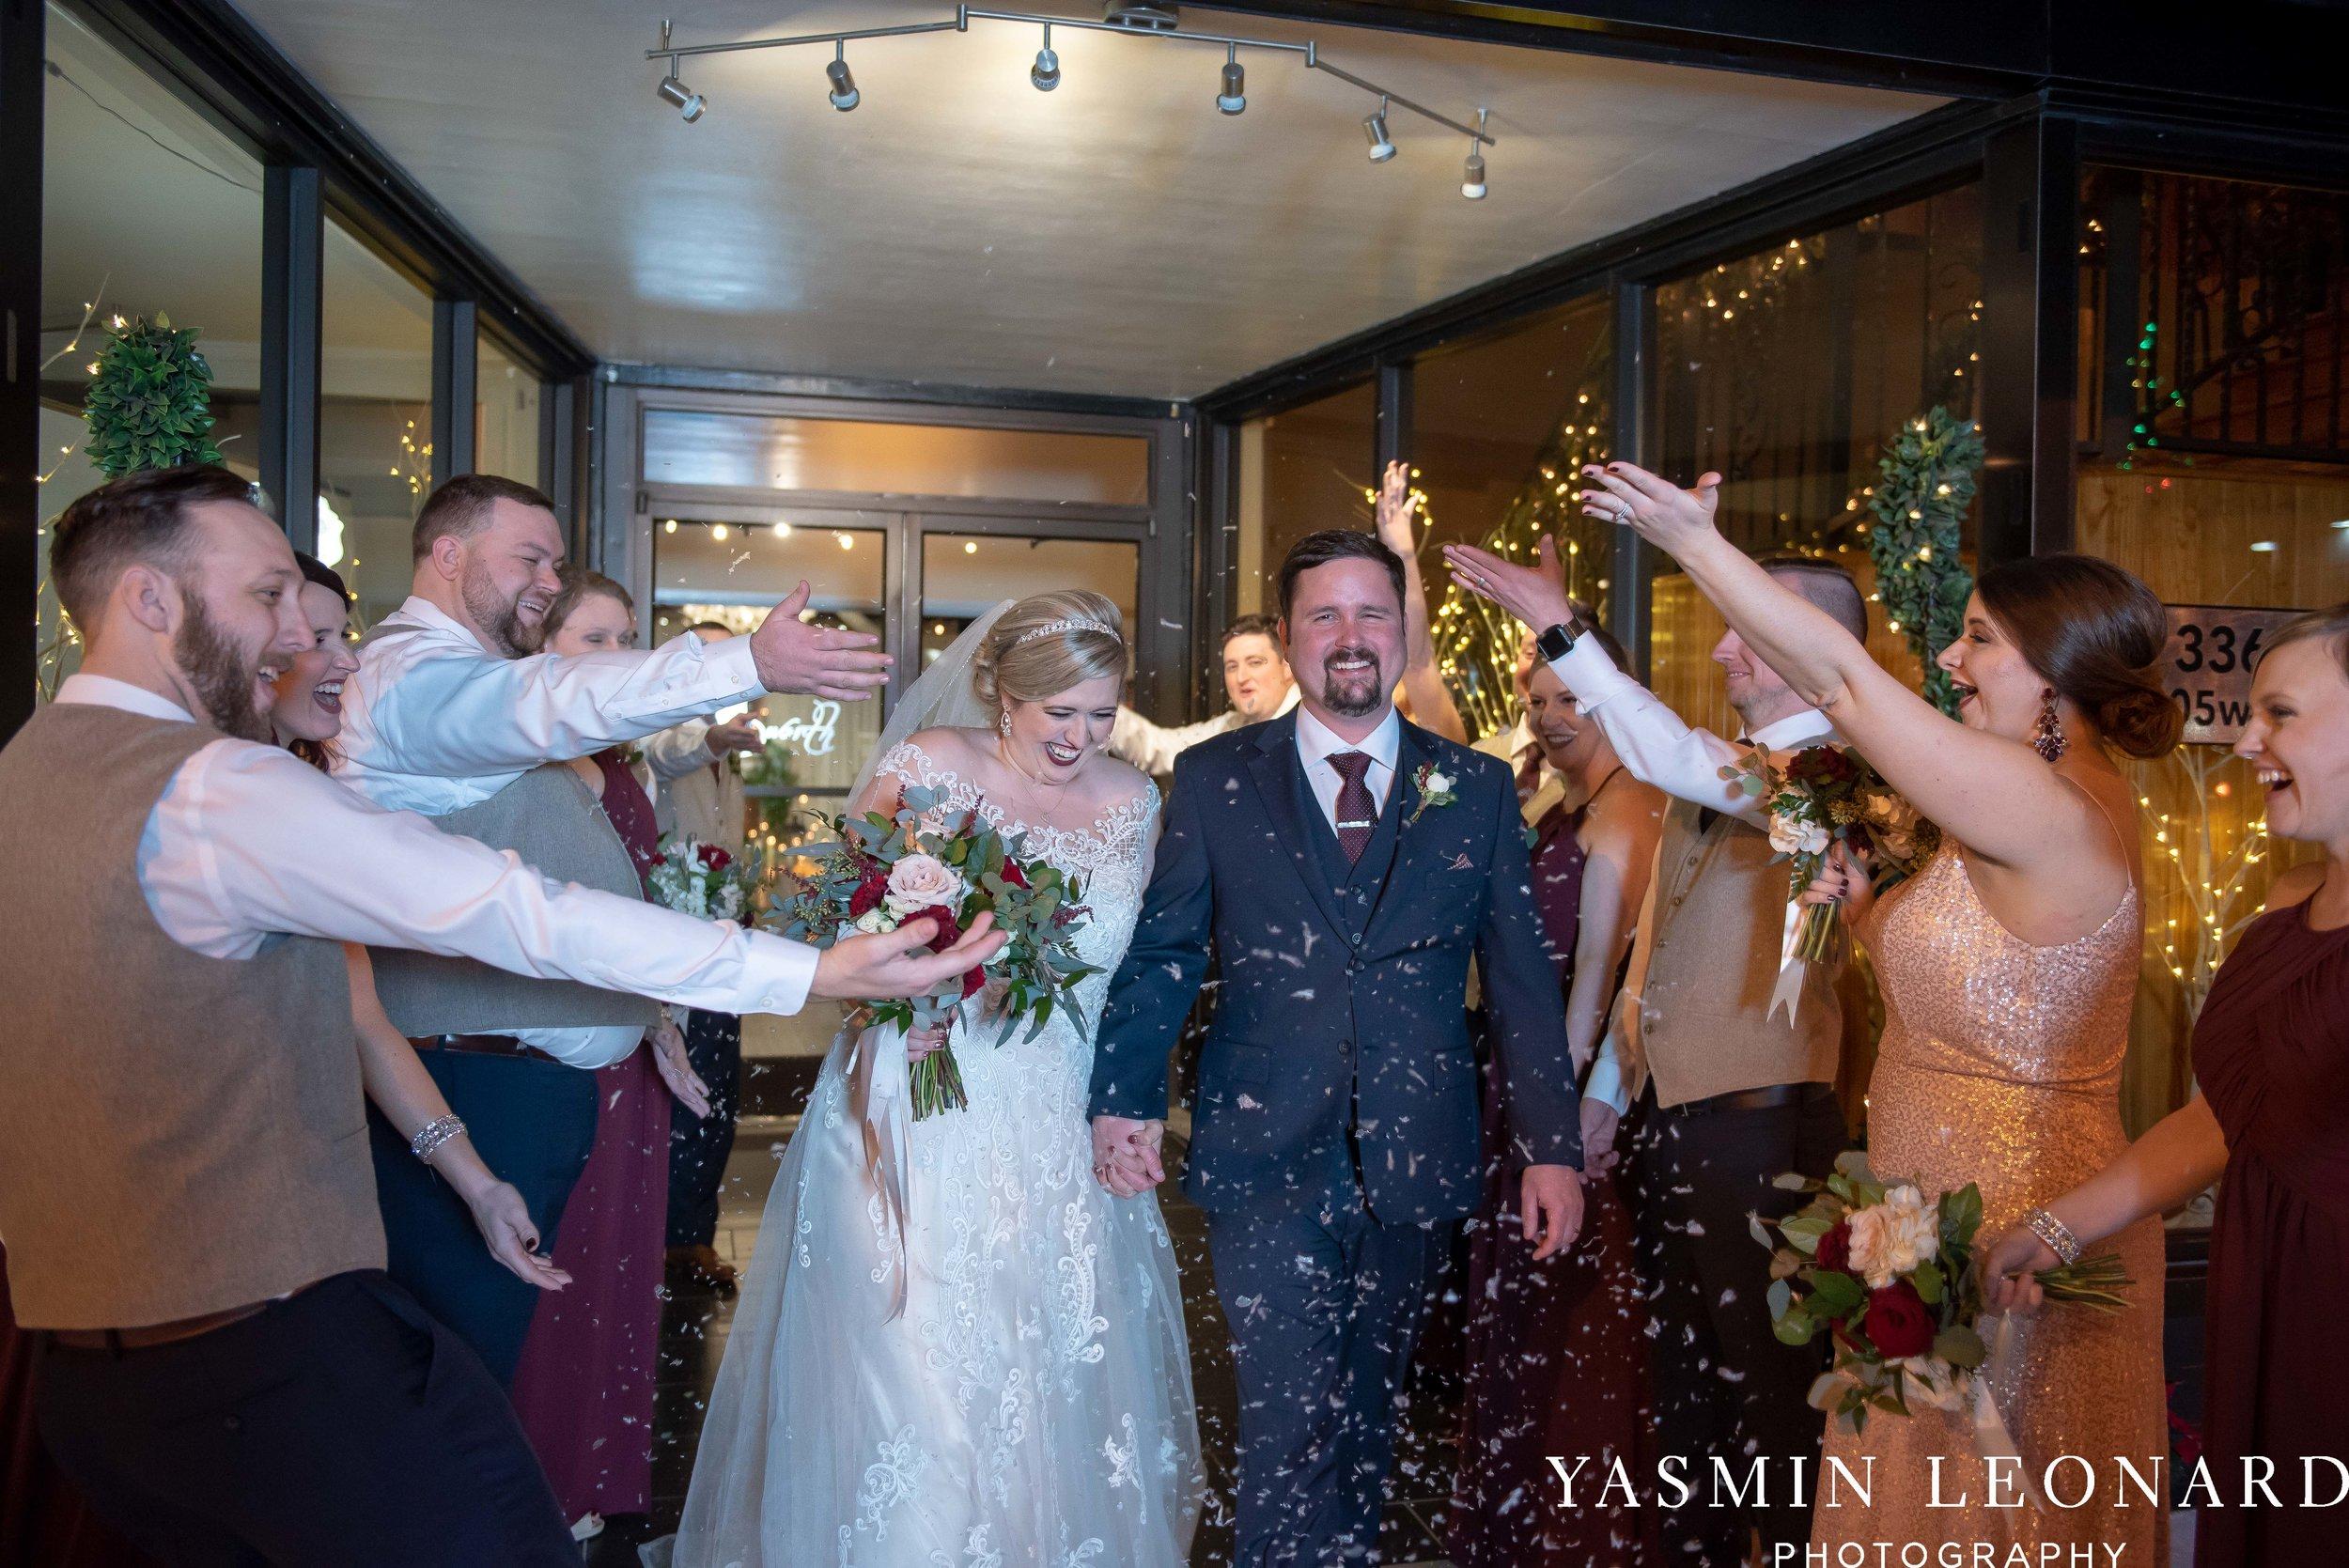 Rebekah and Matt - 105 Worth Event Centre - Yasmin Leonard Photography - Asheboro Wedding - NC Wedding - High Point Weddings - Triad Weddings - Winter Wedding-36.jpg